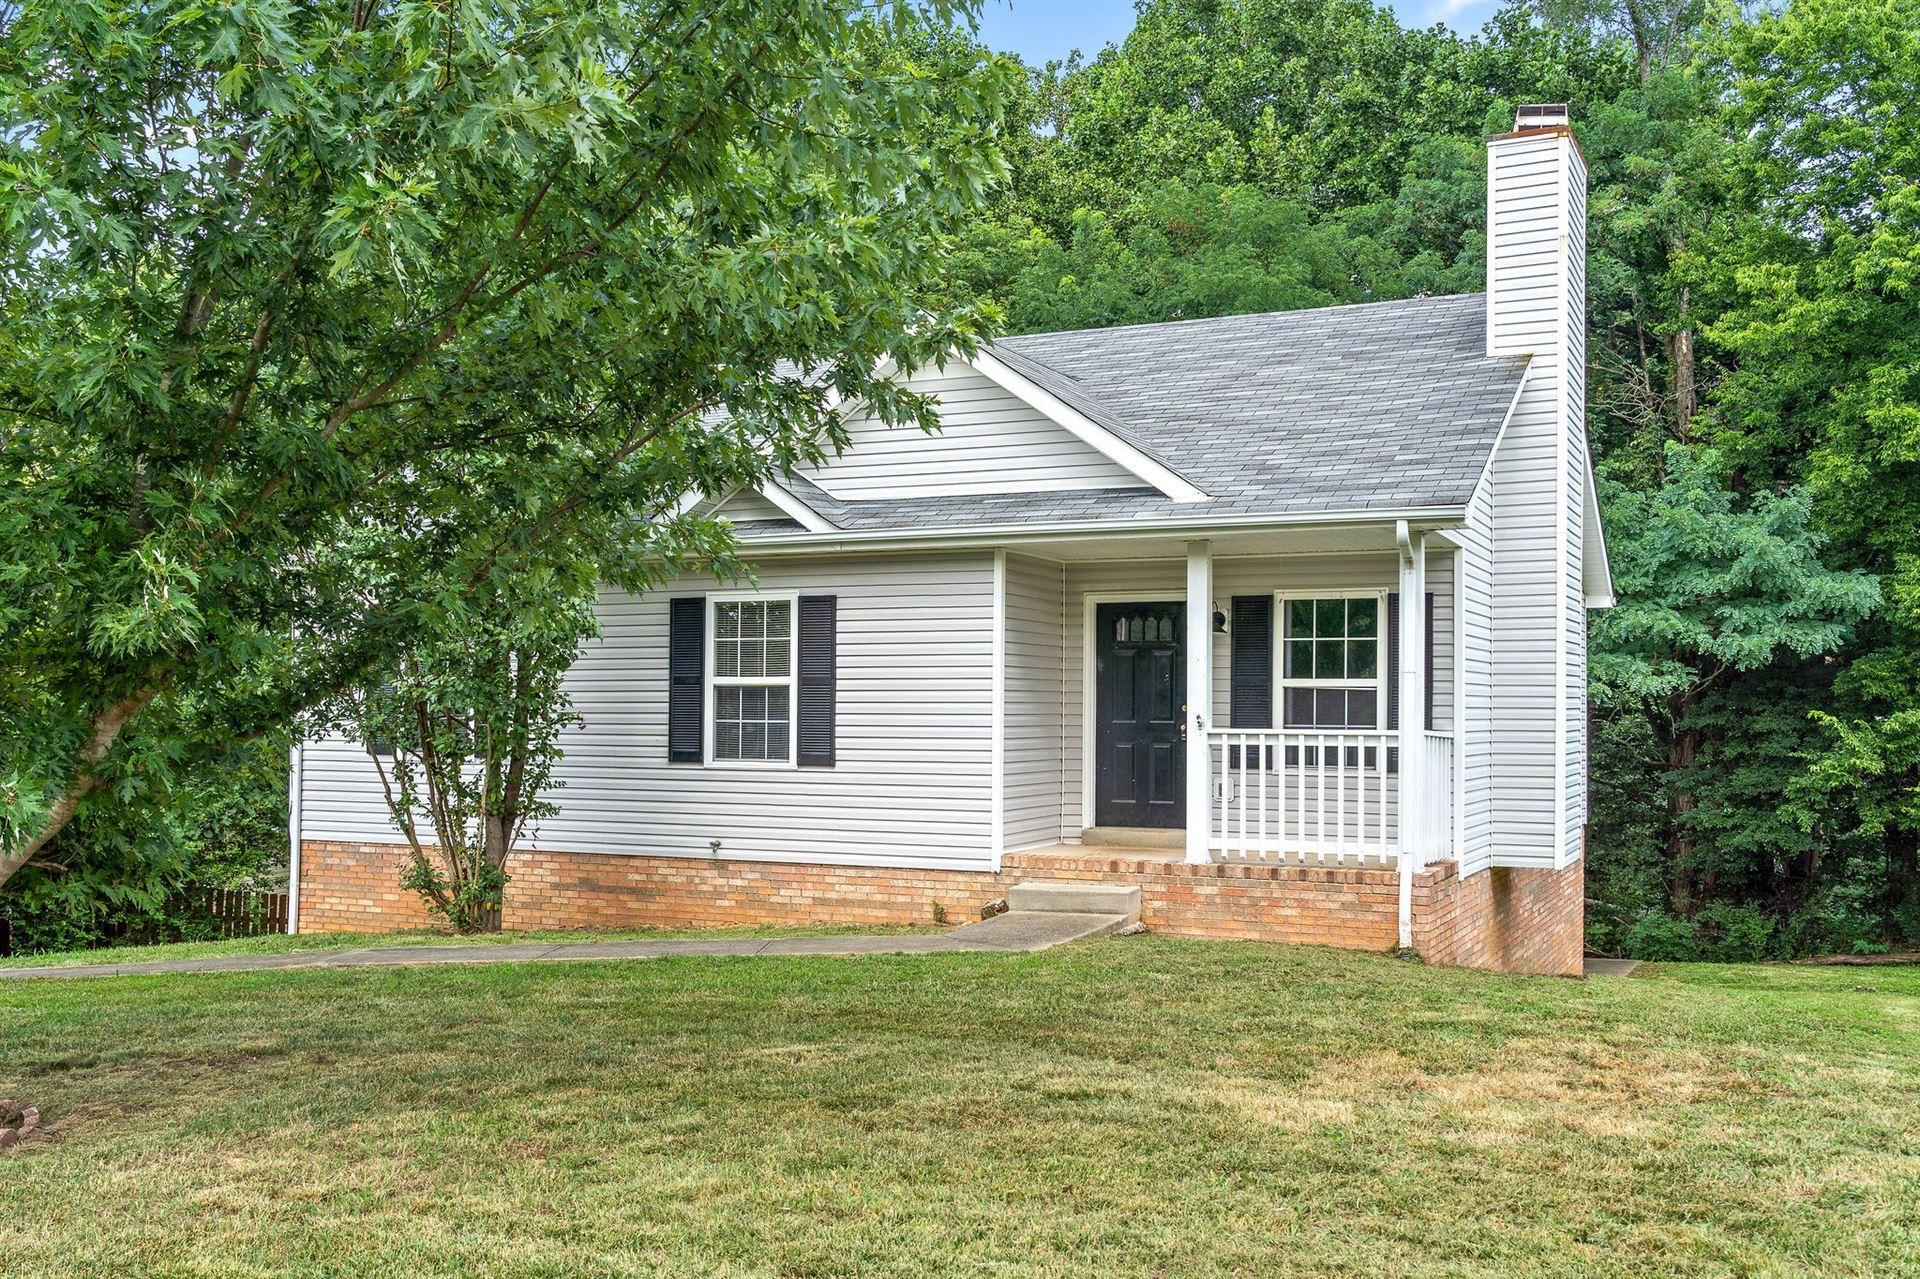 580 Somerset Ln, Clarksville, TN 37042 - MLS#: 2275255